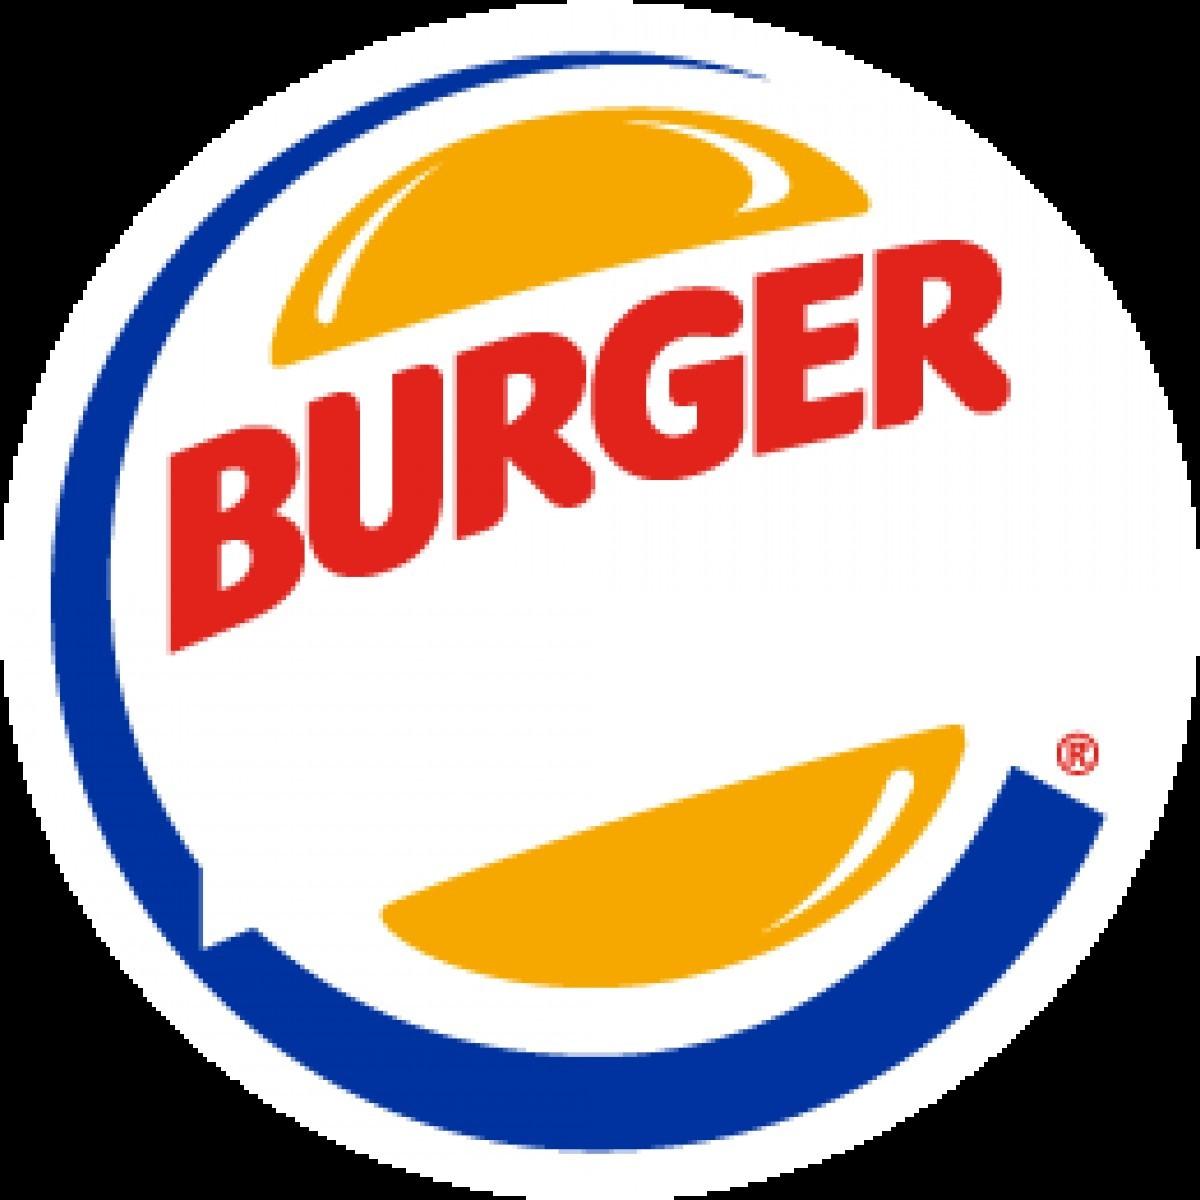 1200x1200 Burger King Burger King Logo Png Vector Free Download